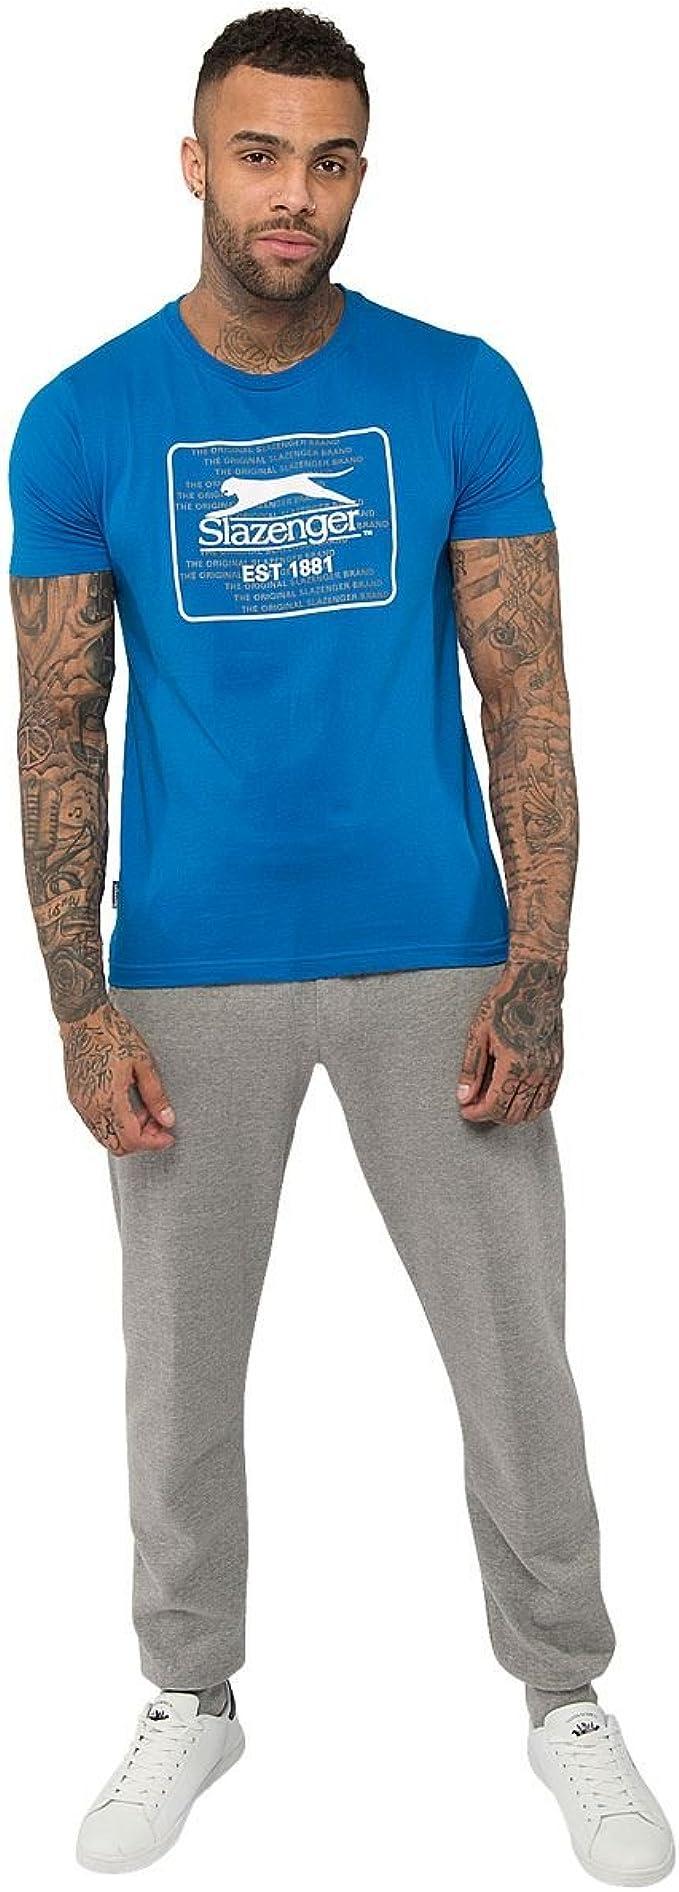 Slazenger - Pantalones de deporte para hombre, ajustados, con ...